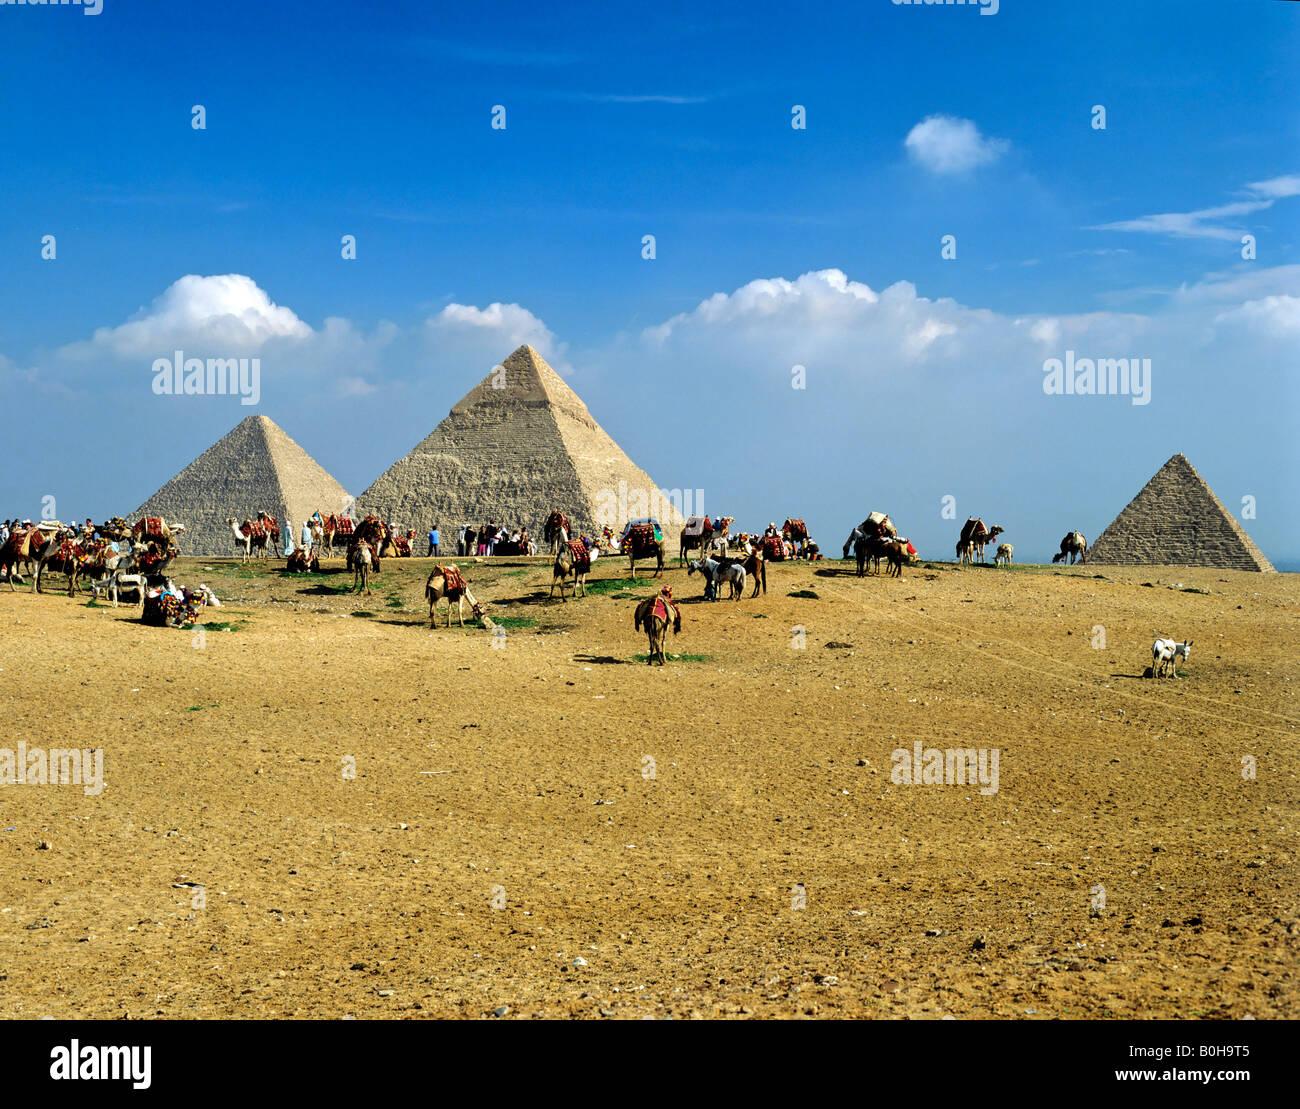 Giza pyramid complex, Khufu, Khafra, Menkorah Pyramids, Cairo, Egypt - Stock Image